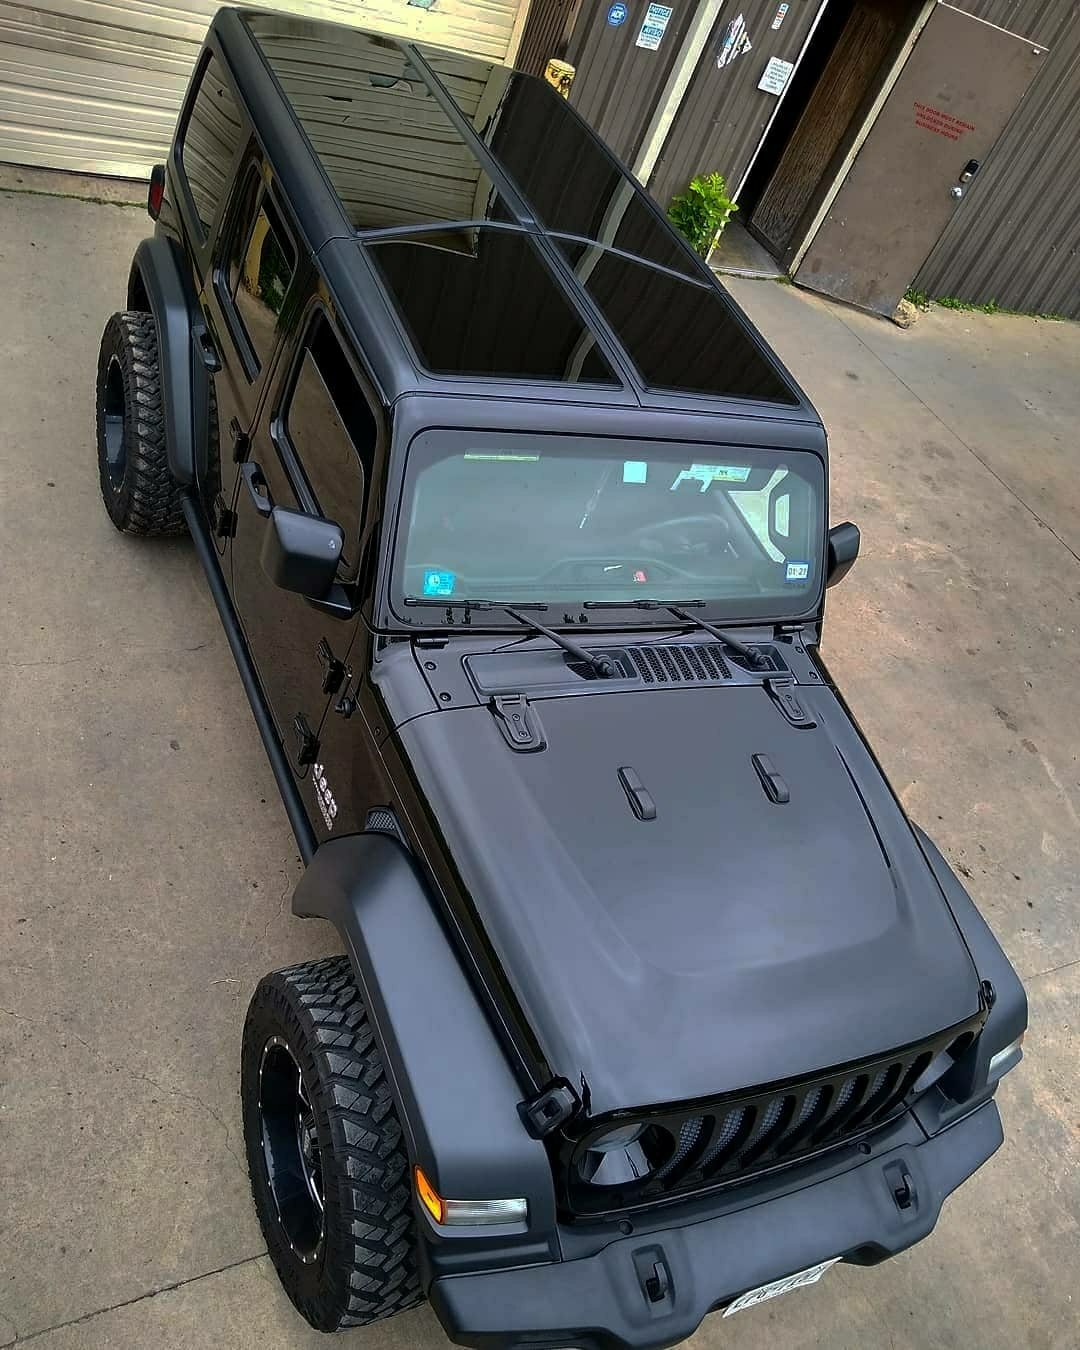 overhead shot of black jeep wrangler